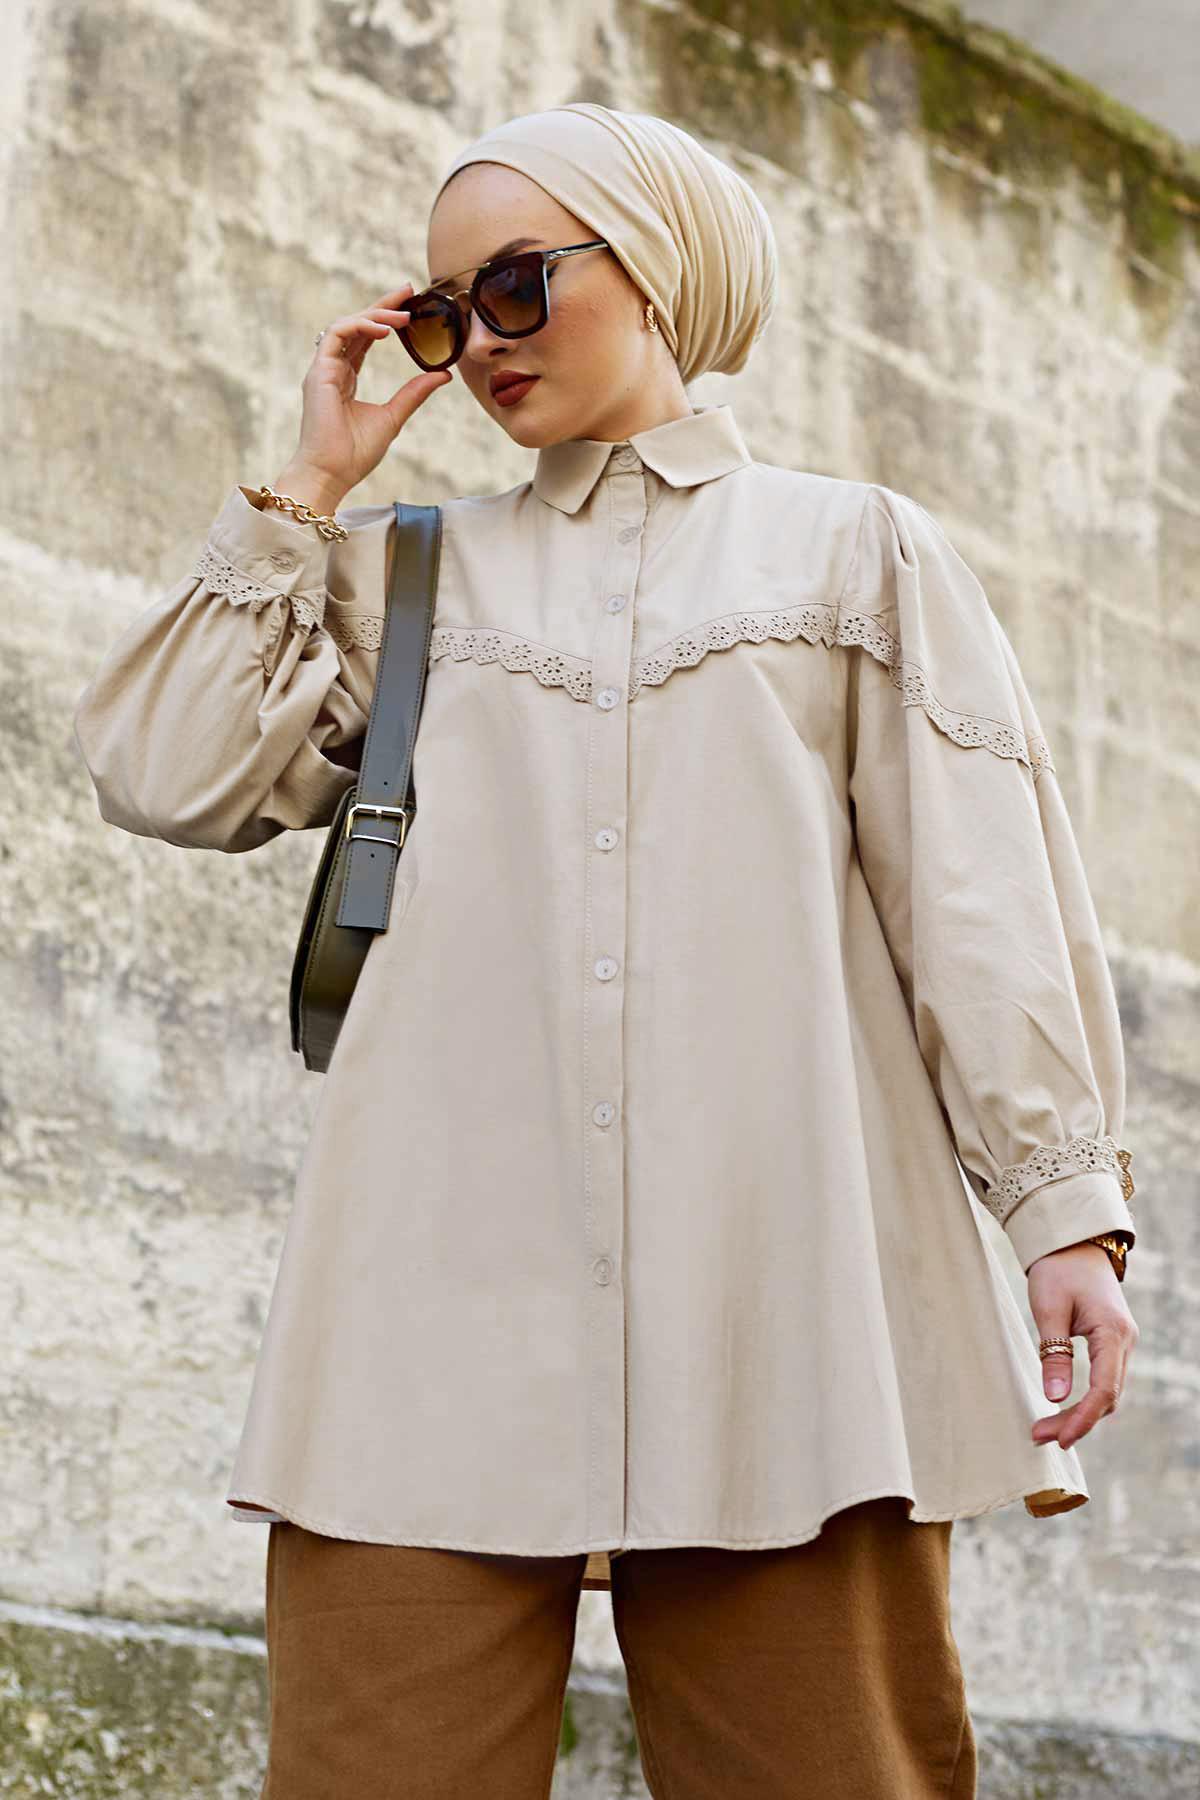 Lace Poplin Shirt Women Blouses Turn down Collar Spring Shirts Plaid All match Batwing sleeve Loose Outwear Harajuku Female